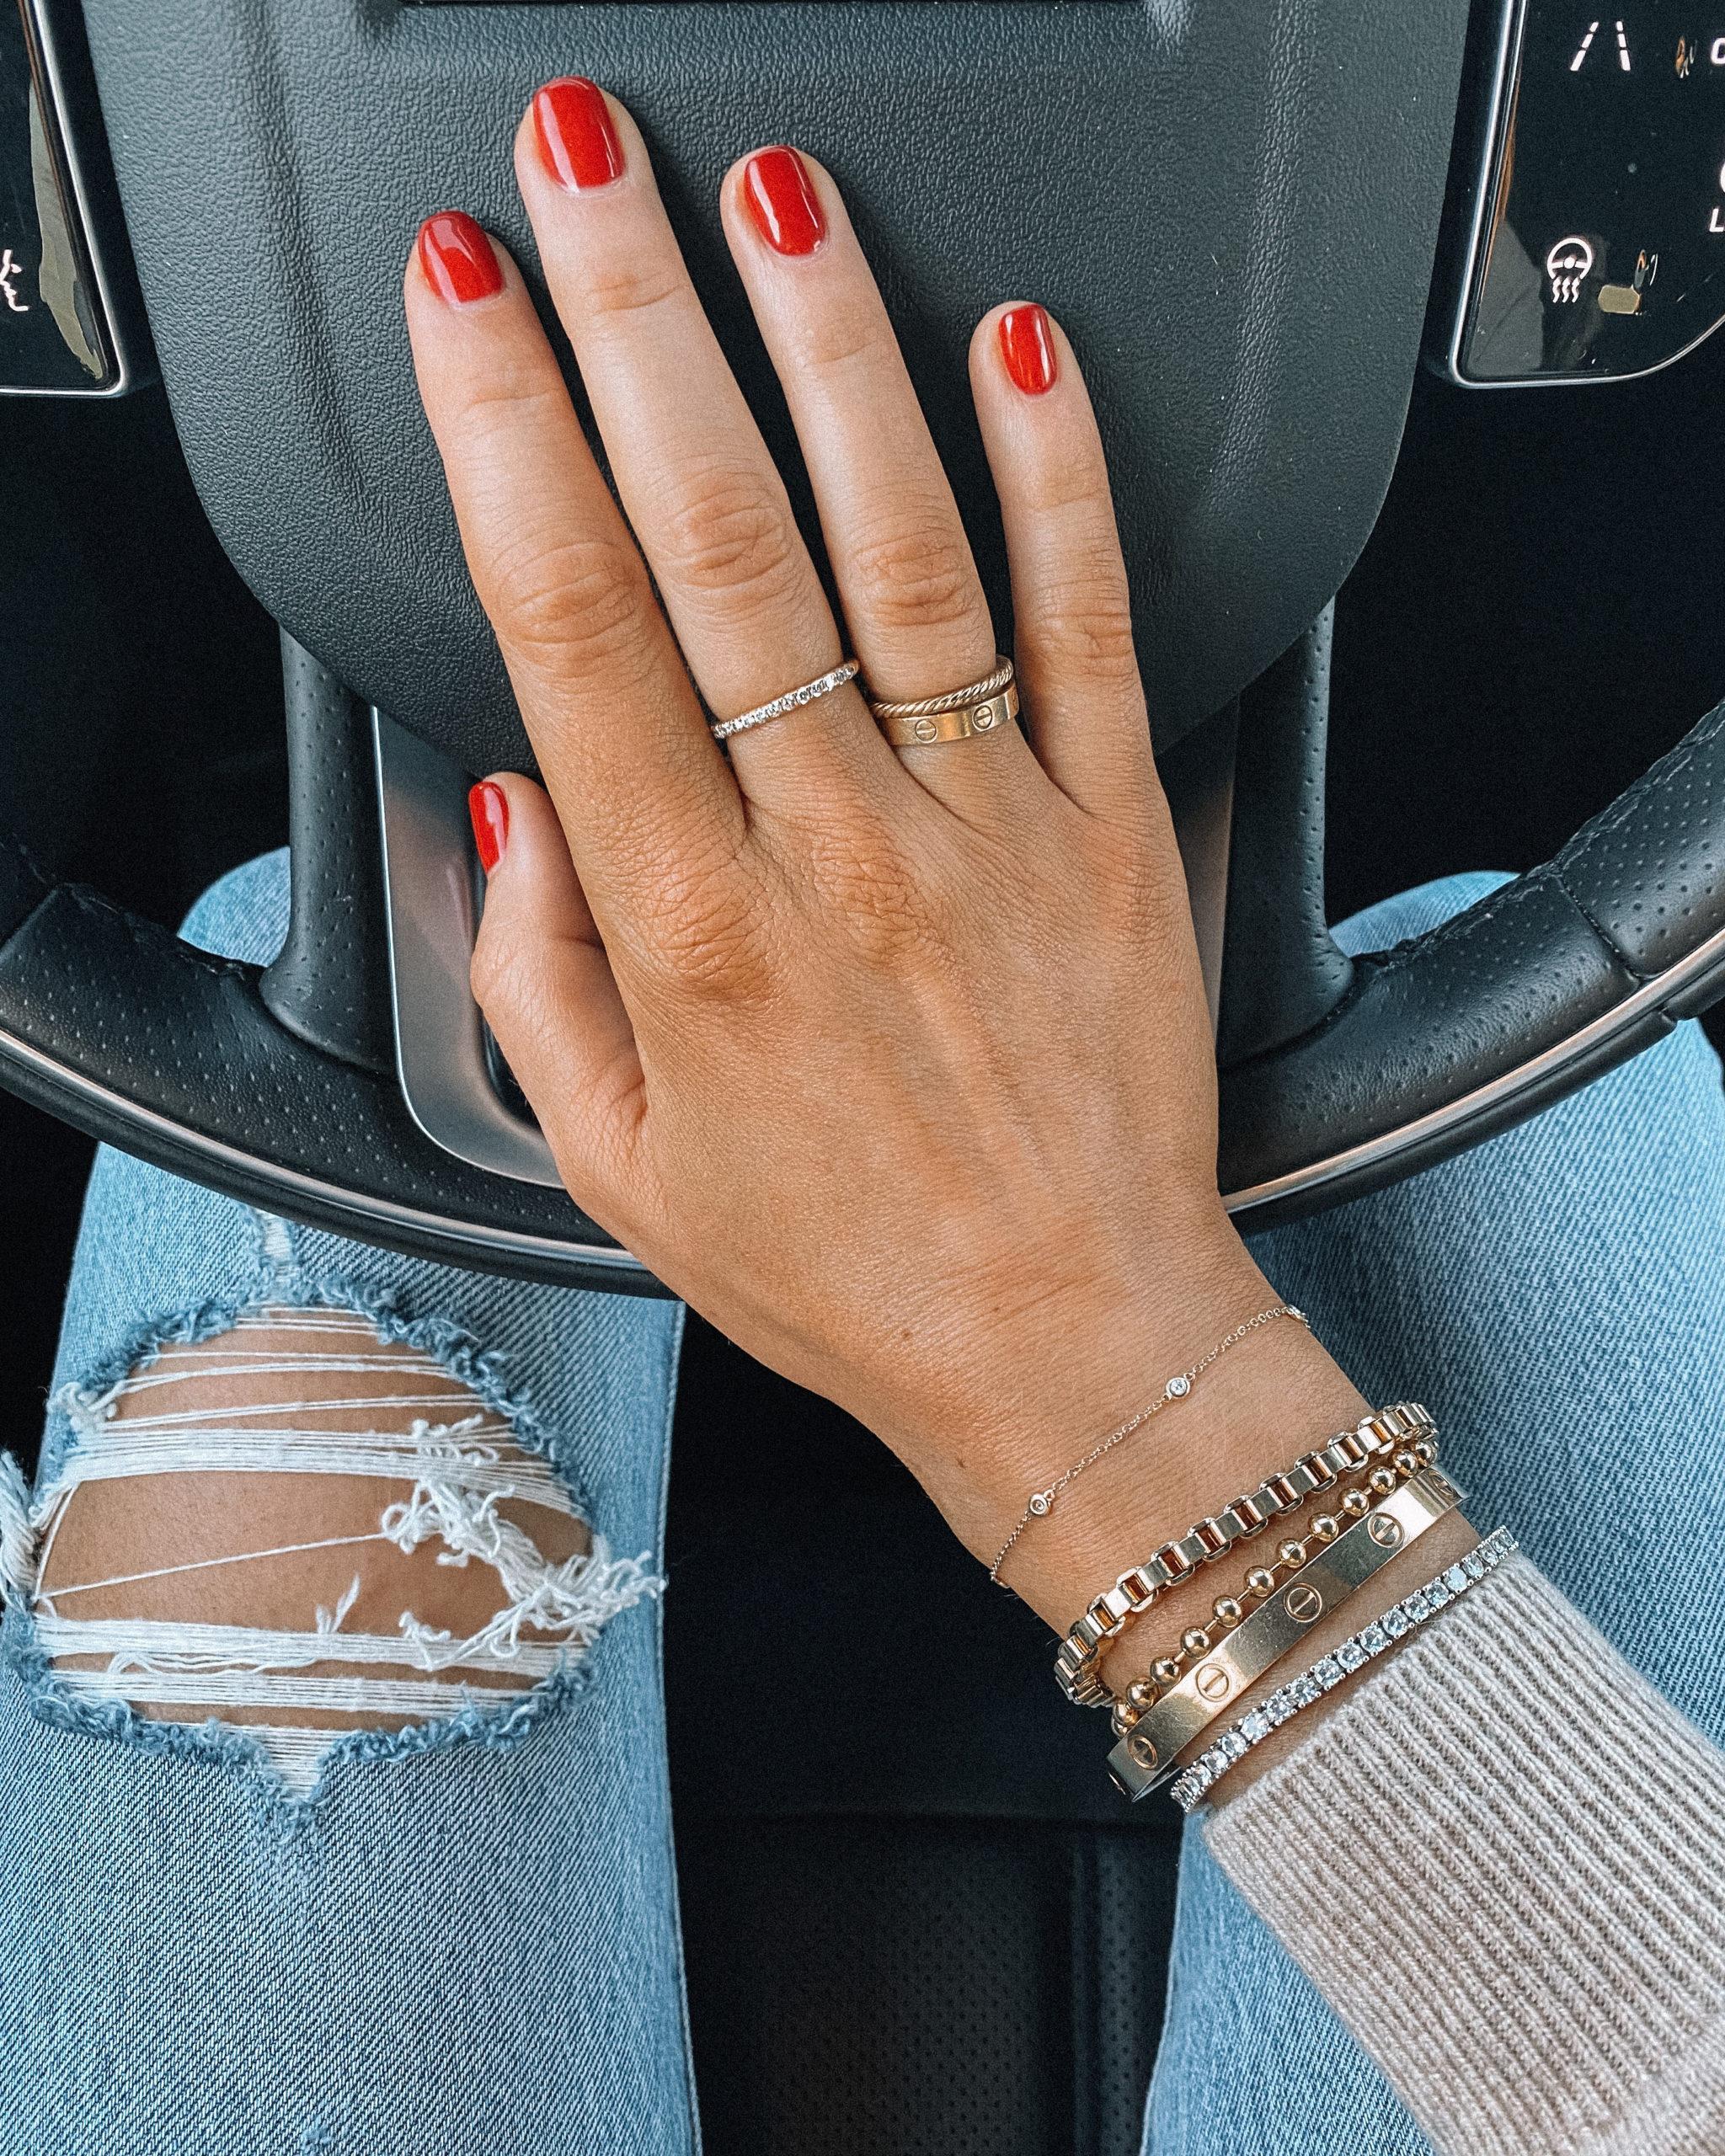 Fashion Jackson Miranda Frye Jewelry OPI Big Apple Red Nail Polish